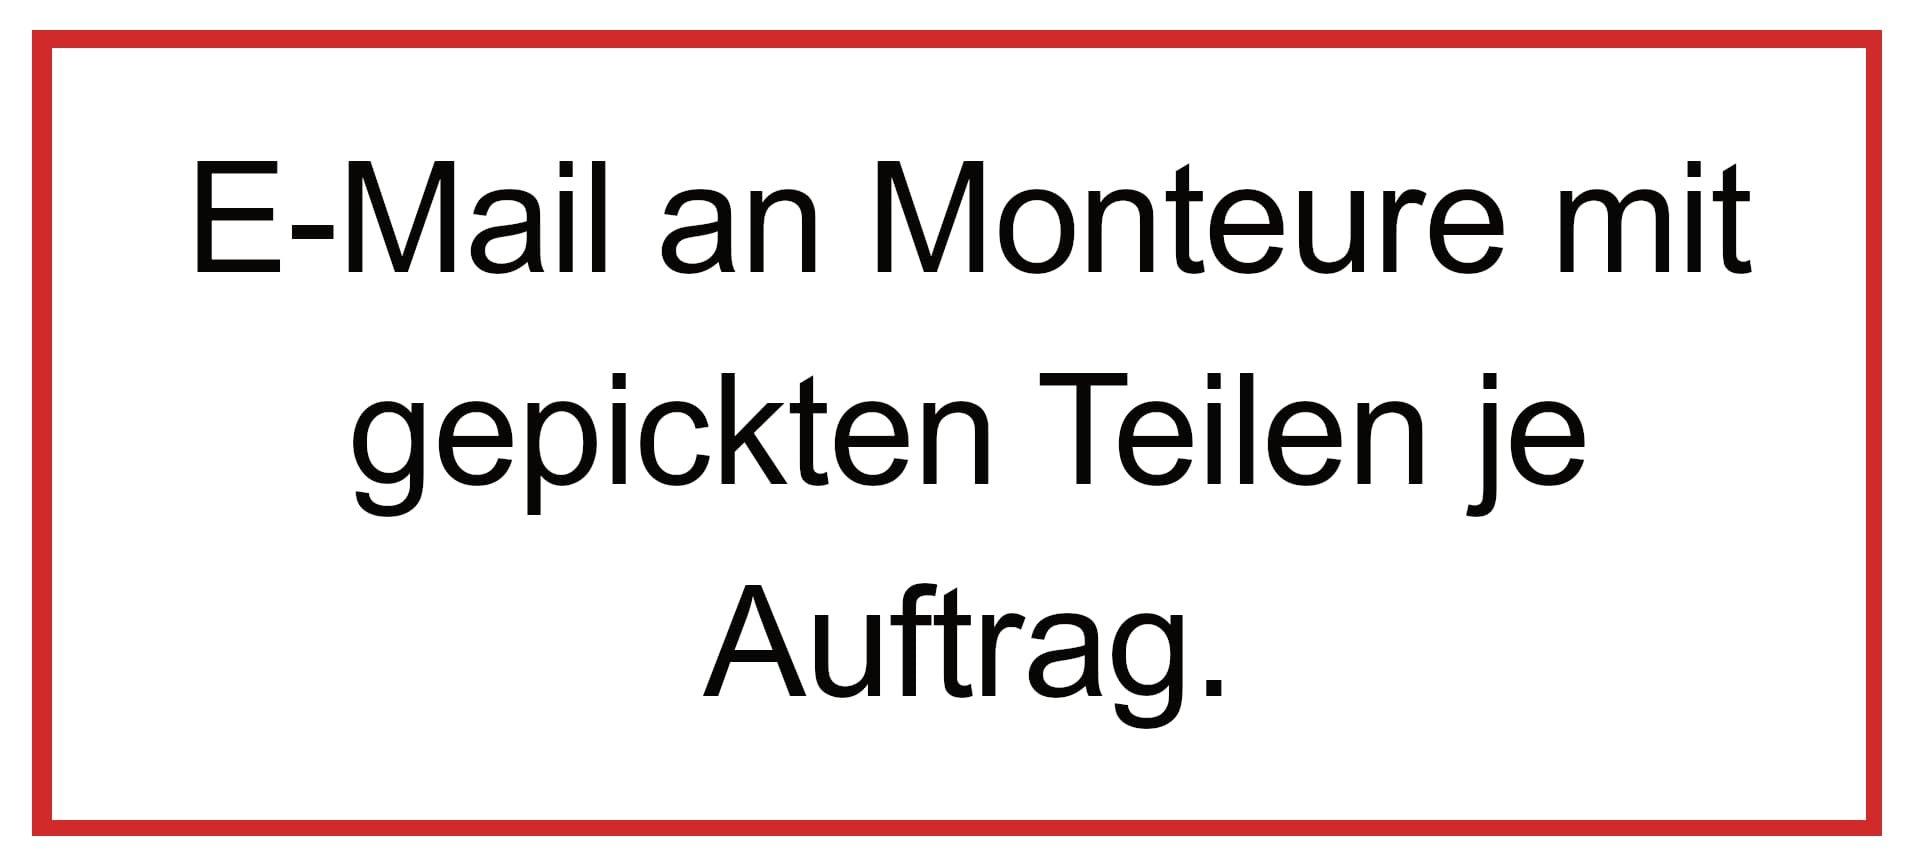 Automatische E-Mail an Monteure mit gepickten C Teilen.